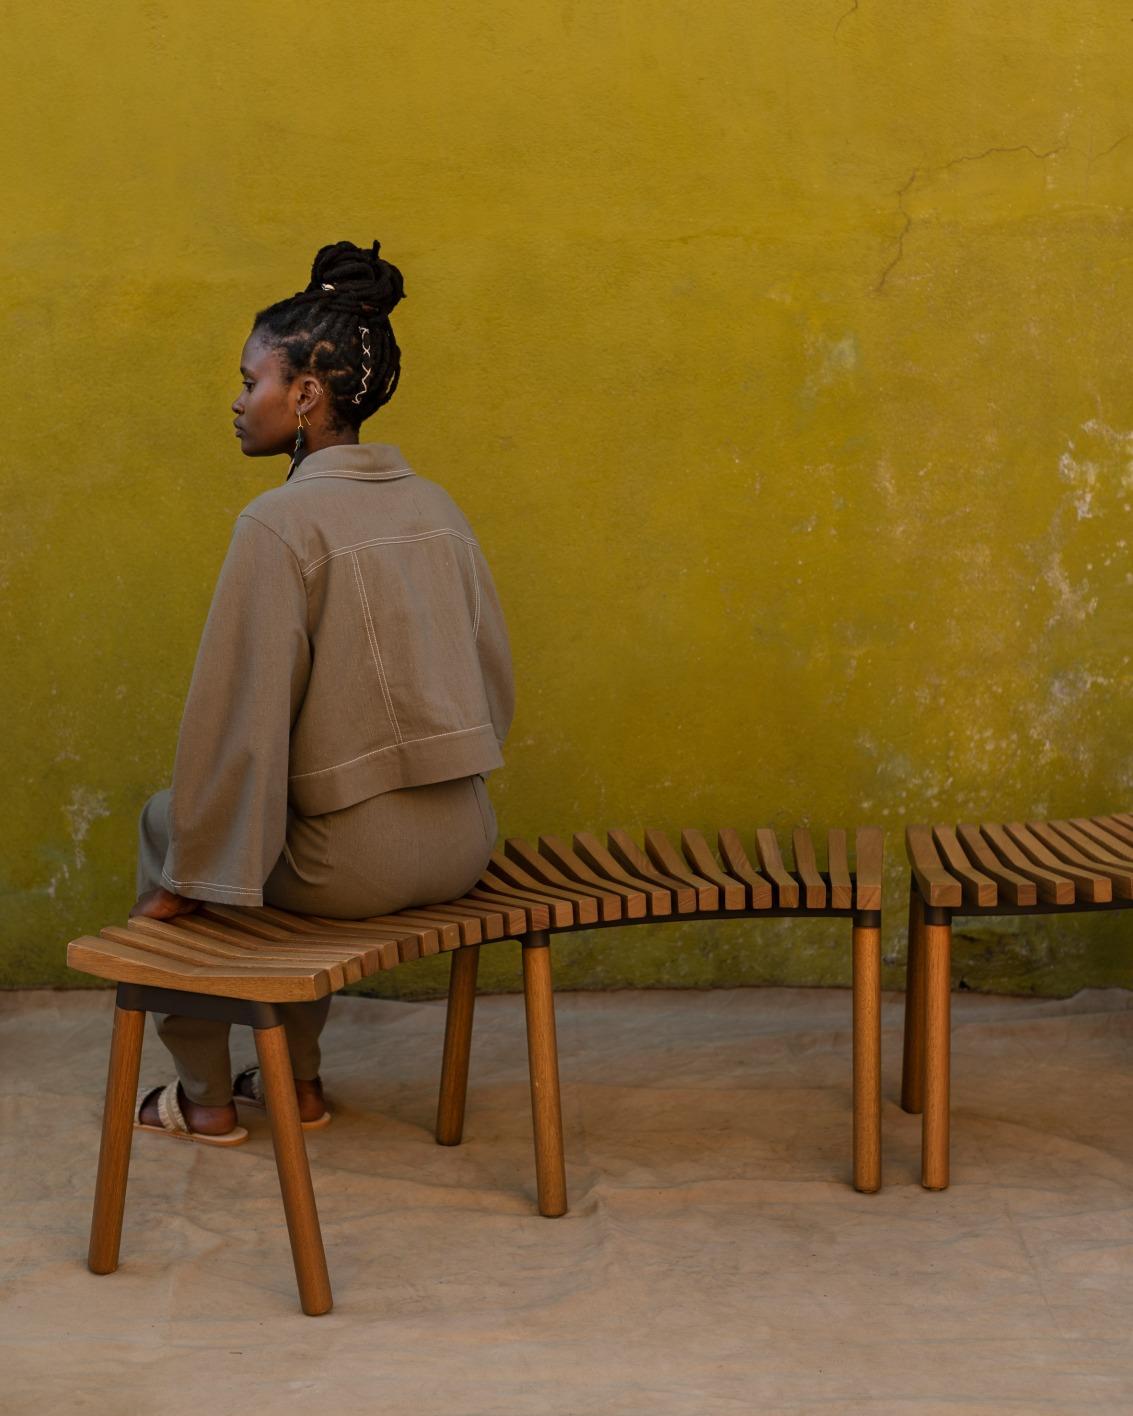 ikea-overallt-design-indaba-african-furniture-homeware_dezeen_2364_col_13